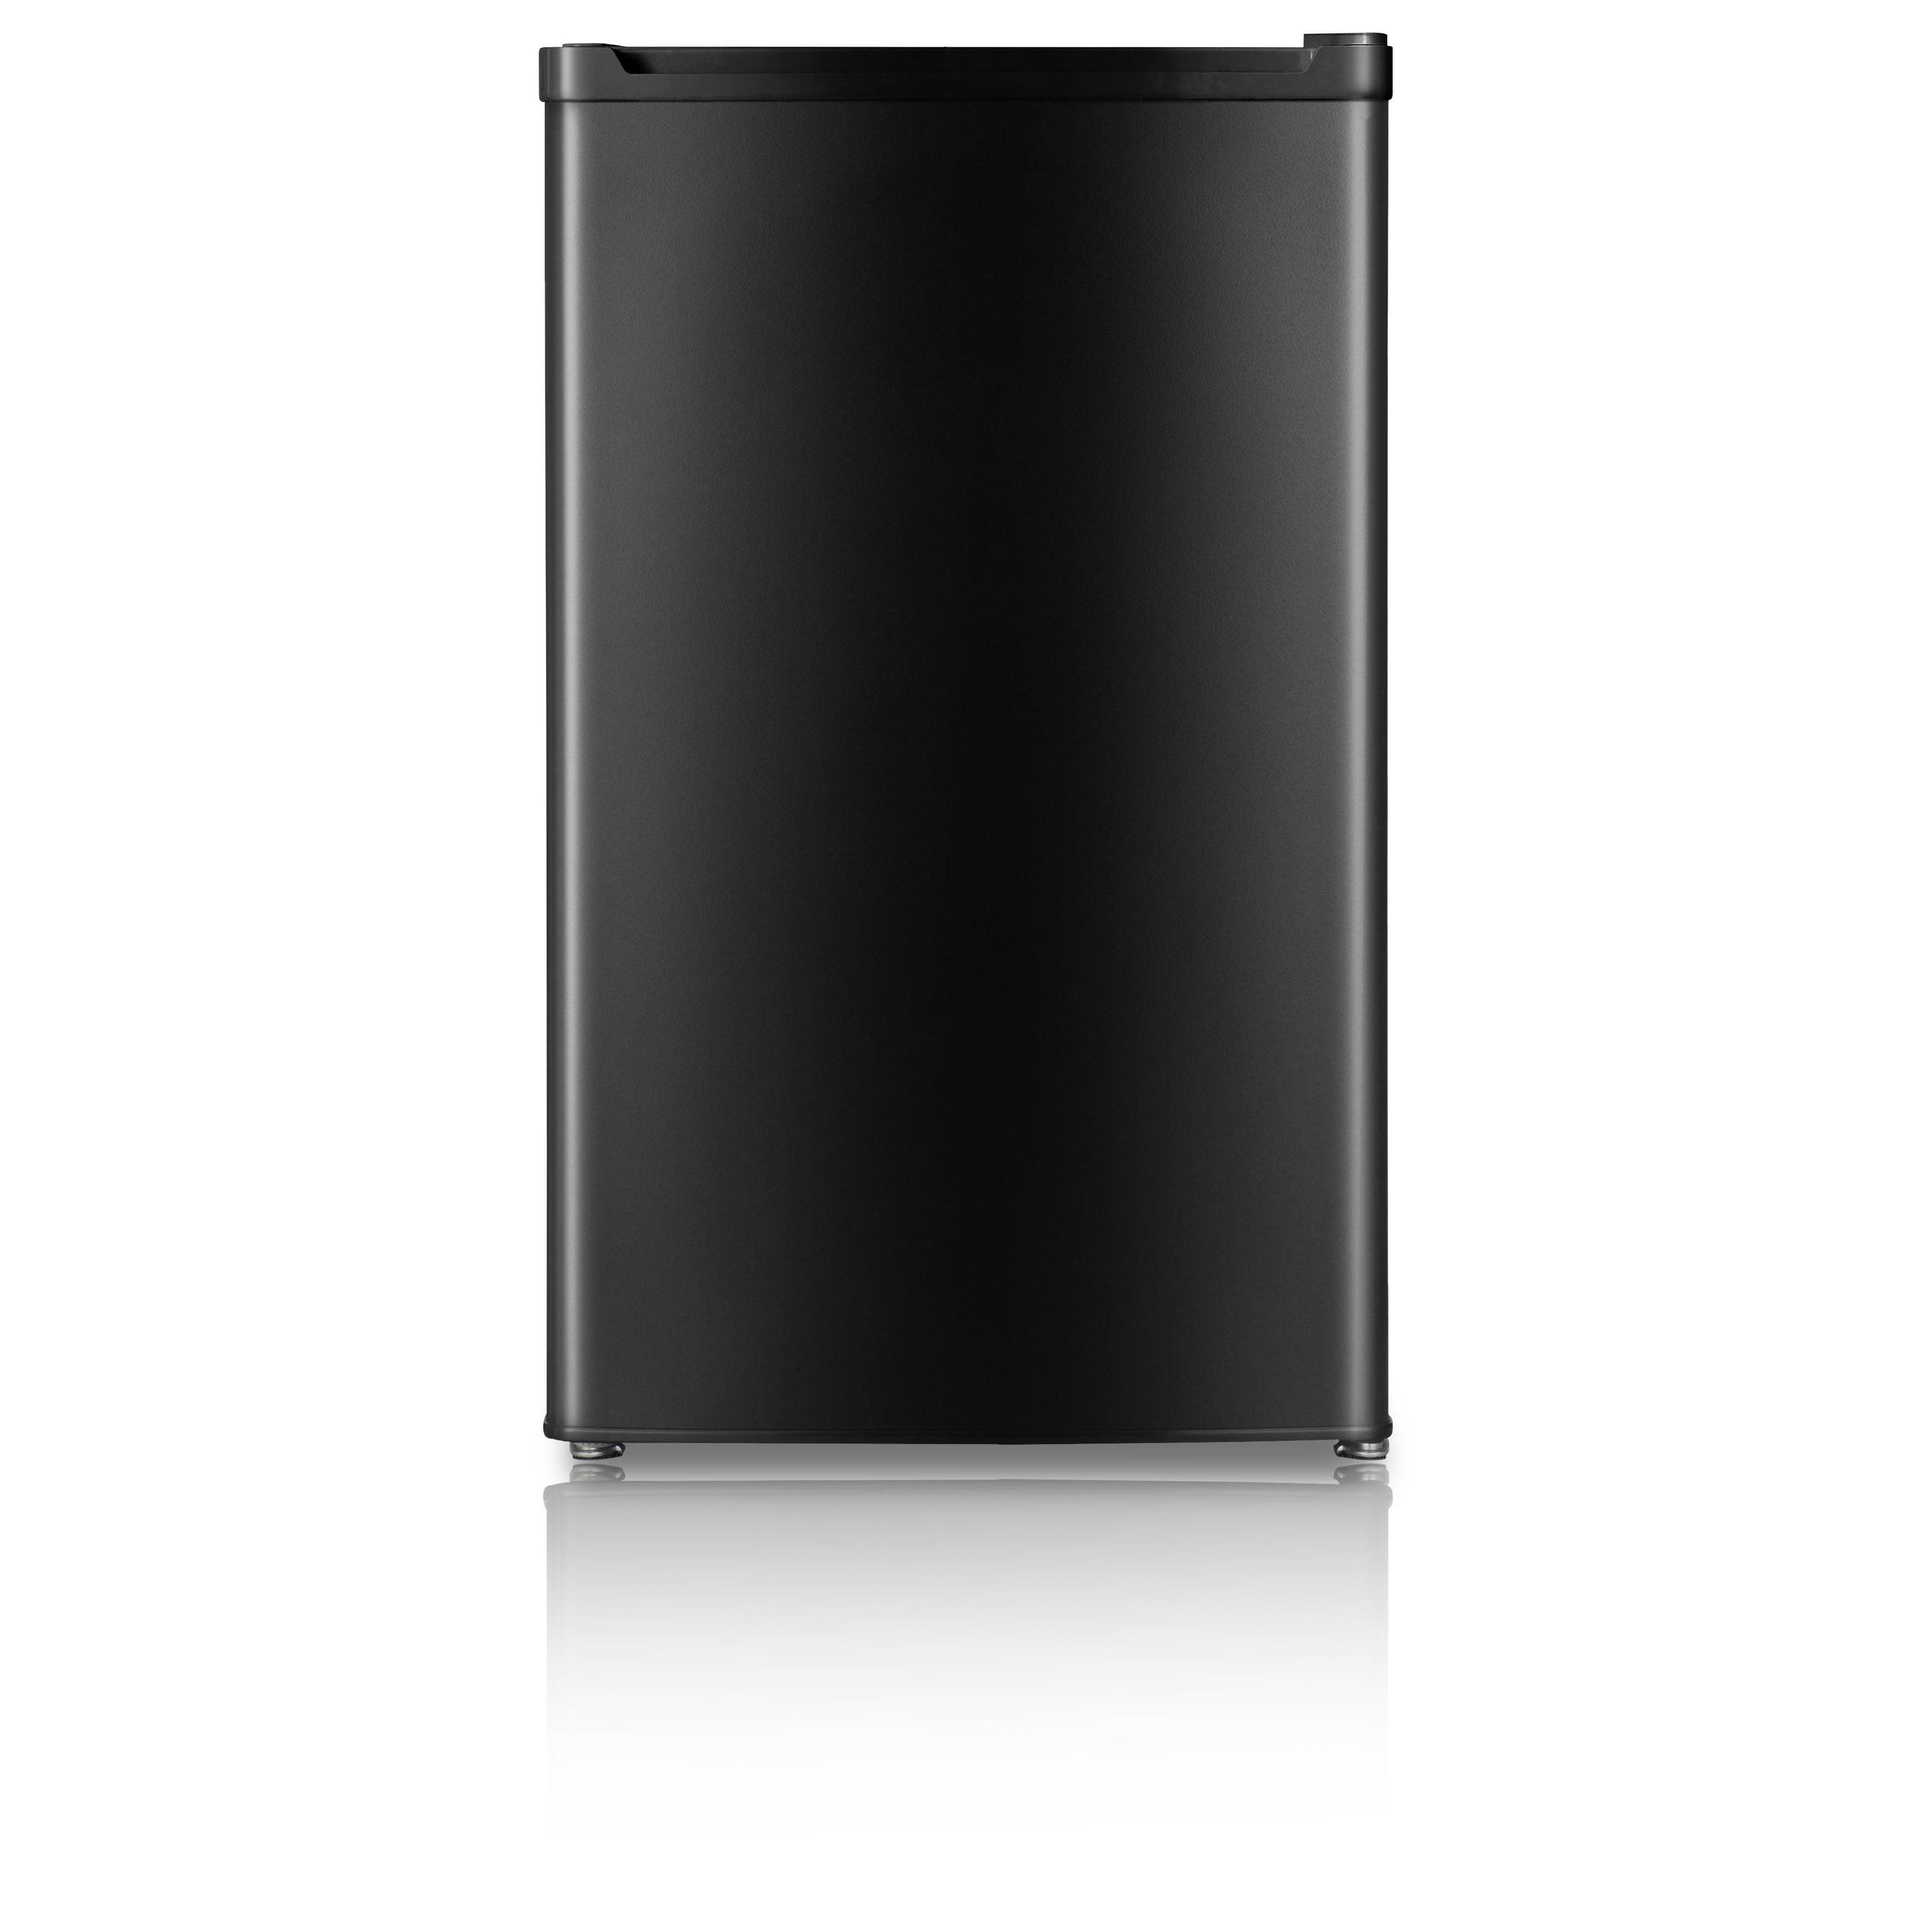 Hisense 3.3 Cf Compact Refrigerator